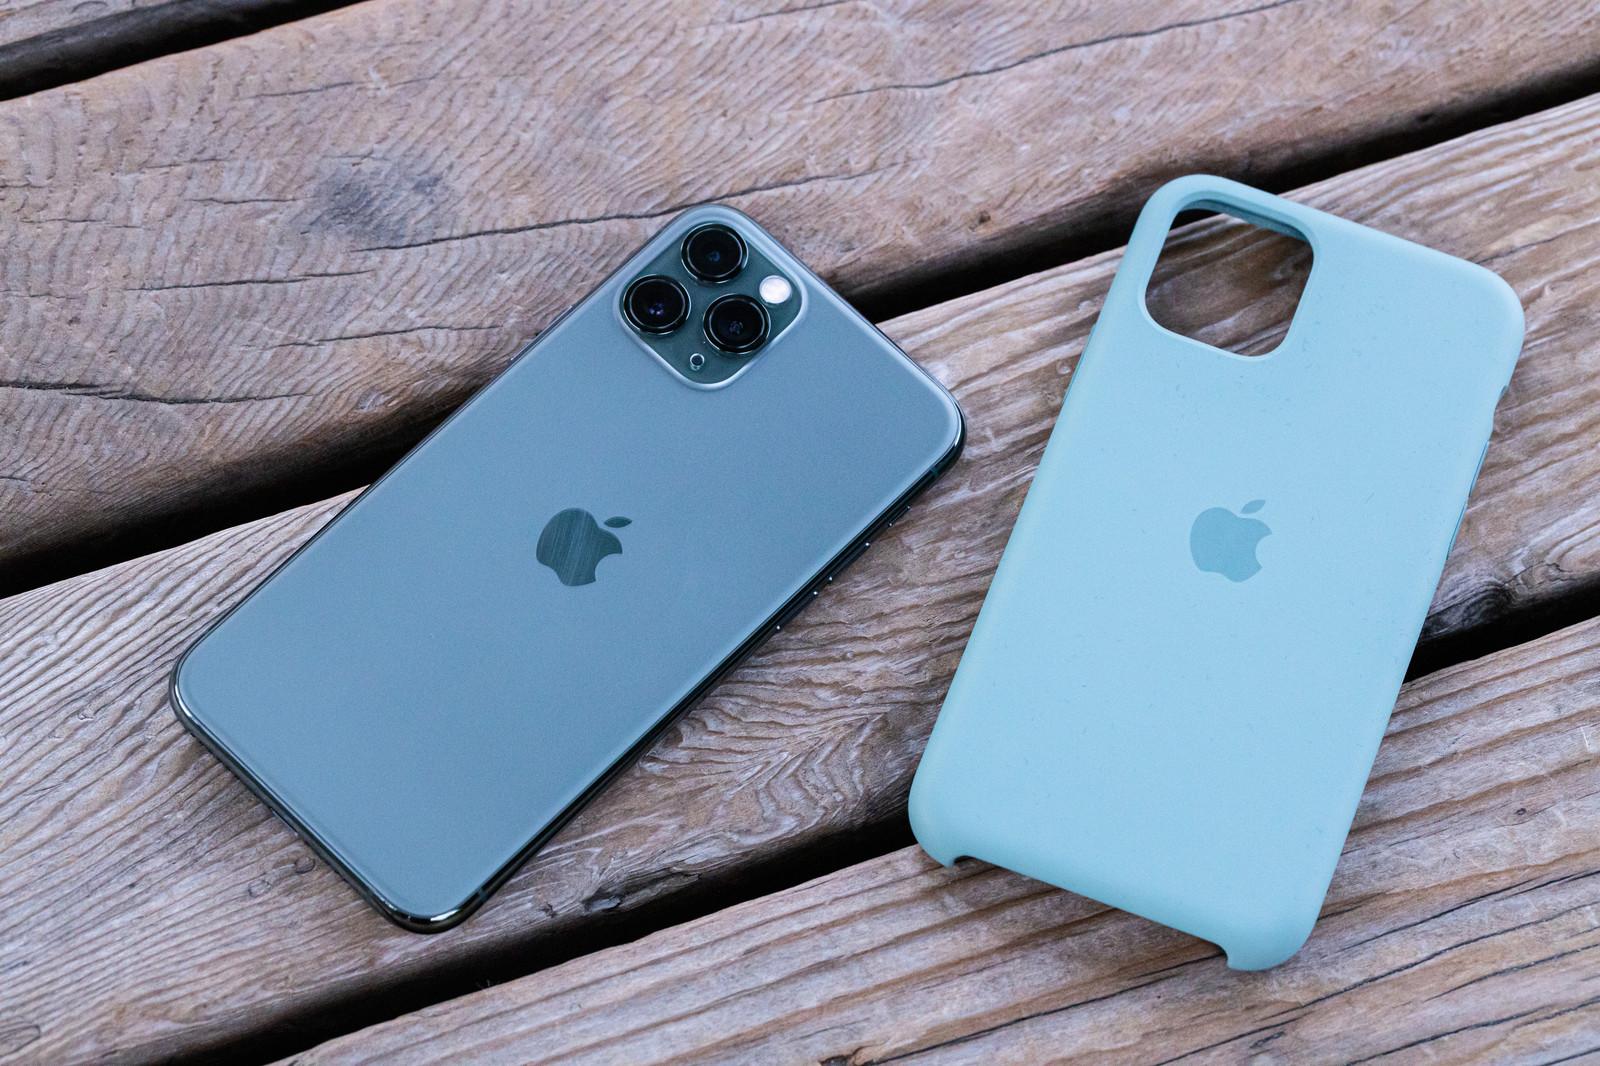 Redmi Note 9Sケース選びはデザイン・安全?Ringkeケースレビュー